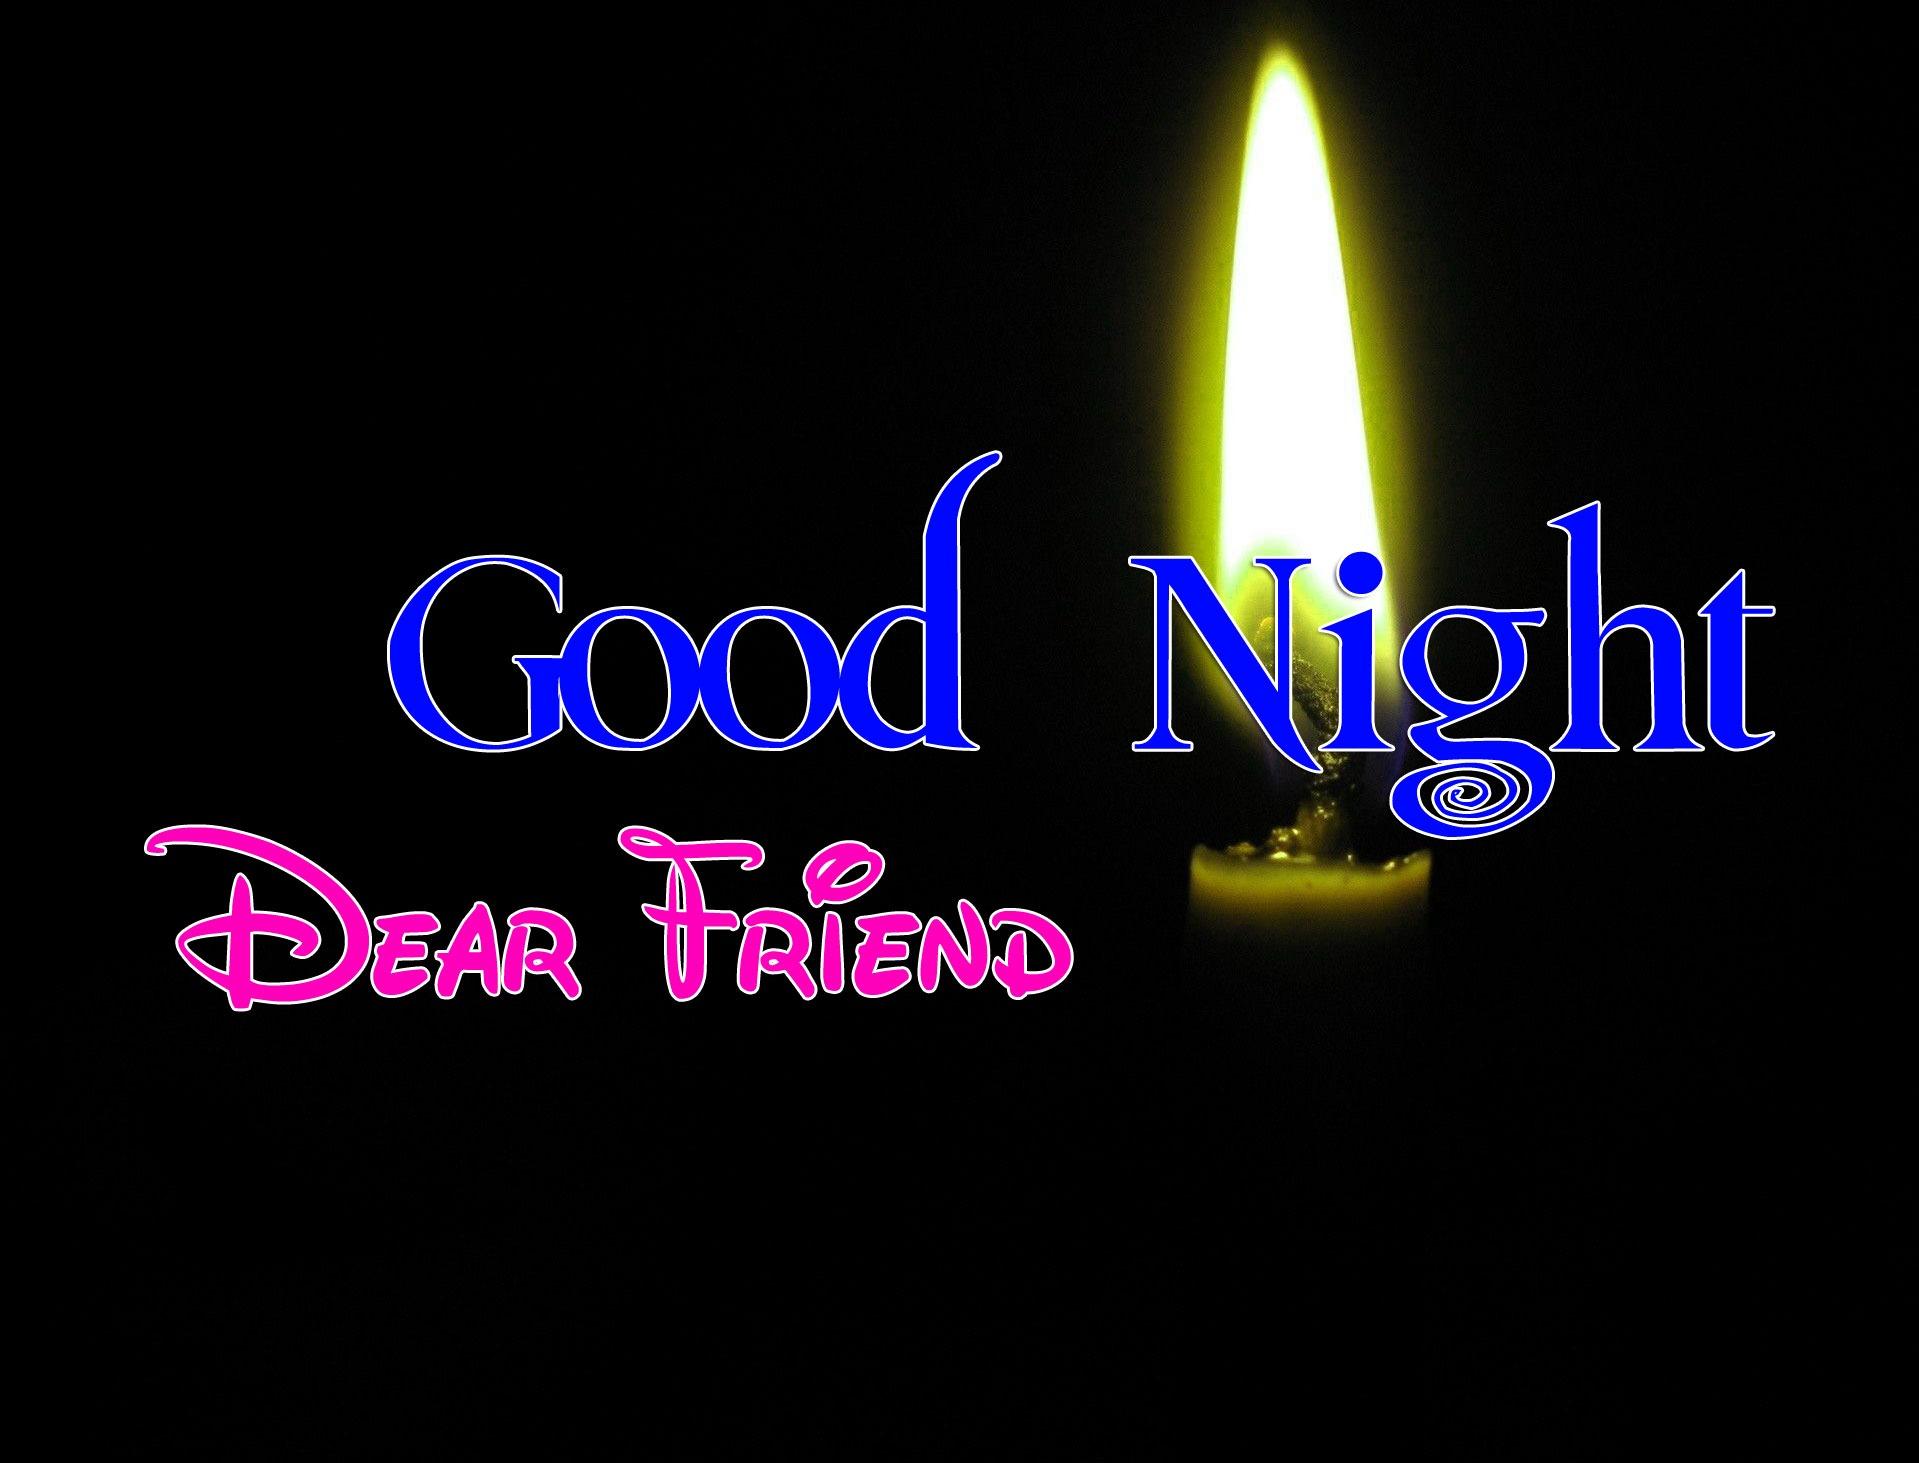 Good Night Wishes Wallpaper Free